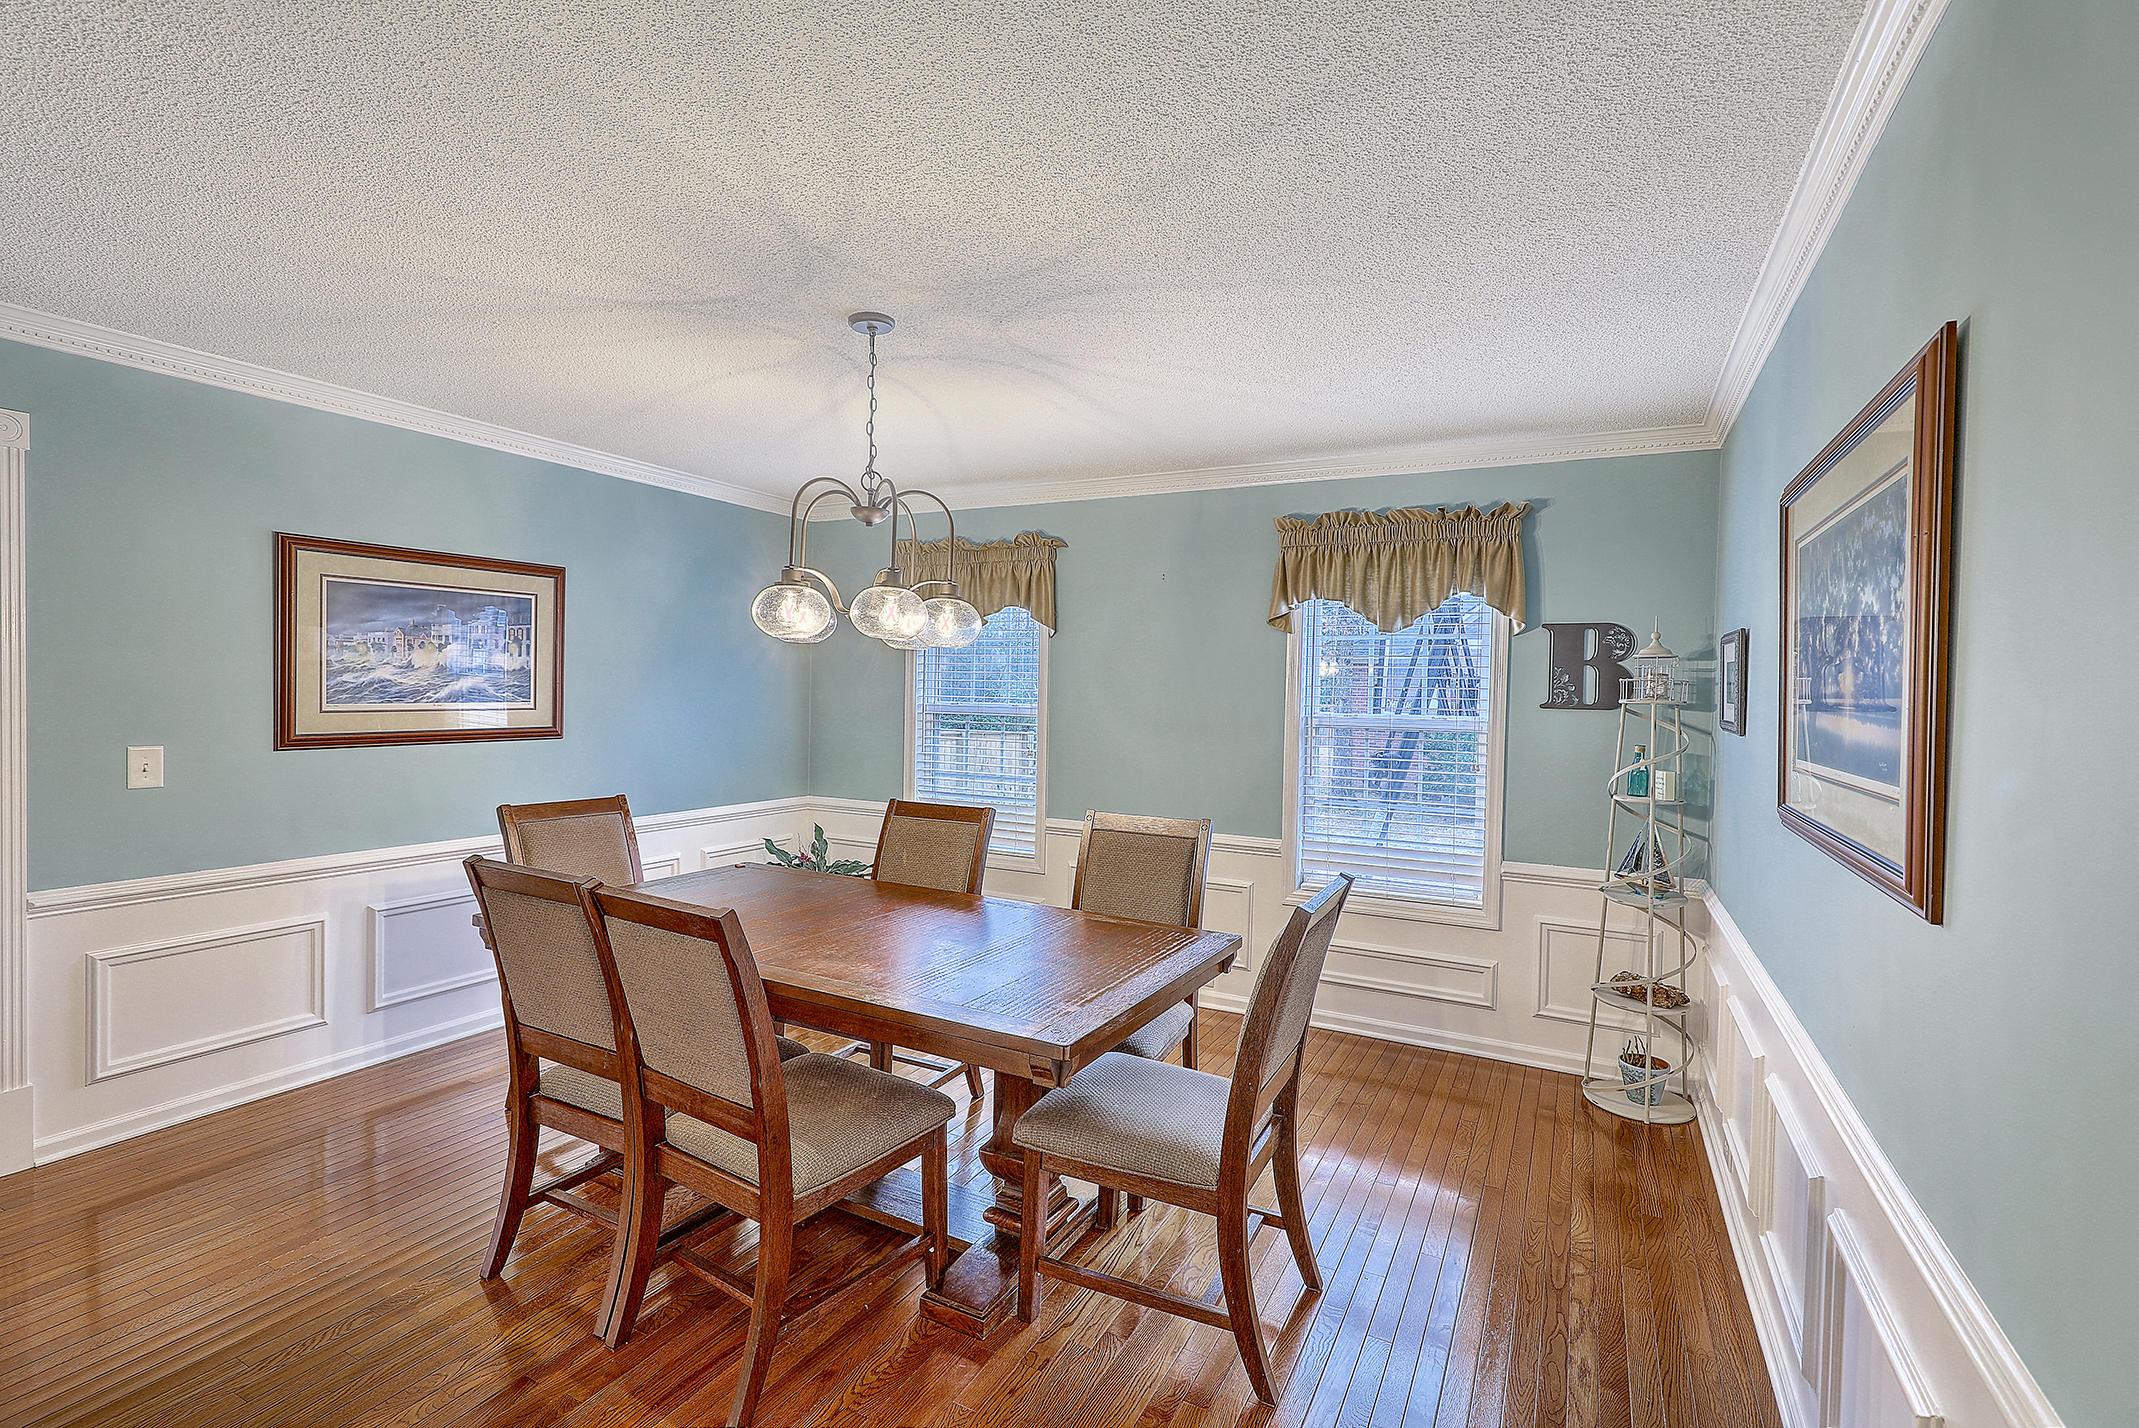 Crowfield Plantation Homes For Sale - 104 Jamesford, Goose Creek, SC - 14